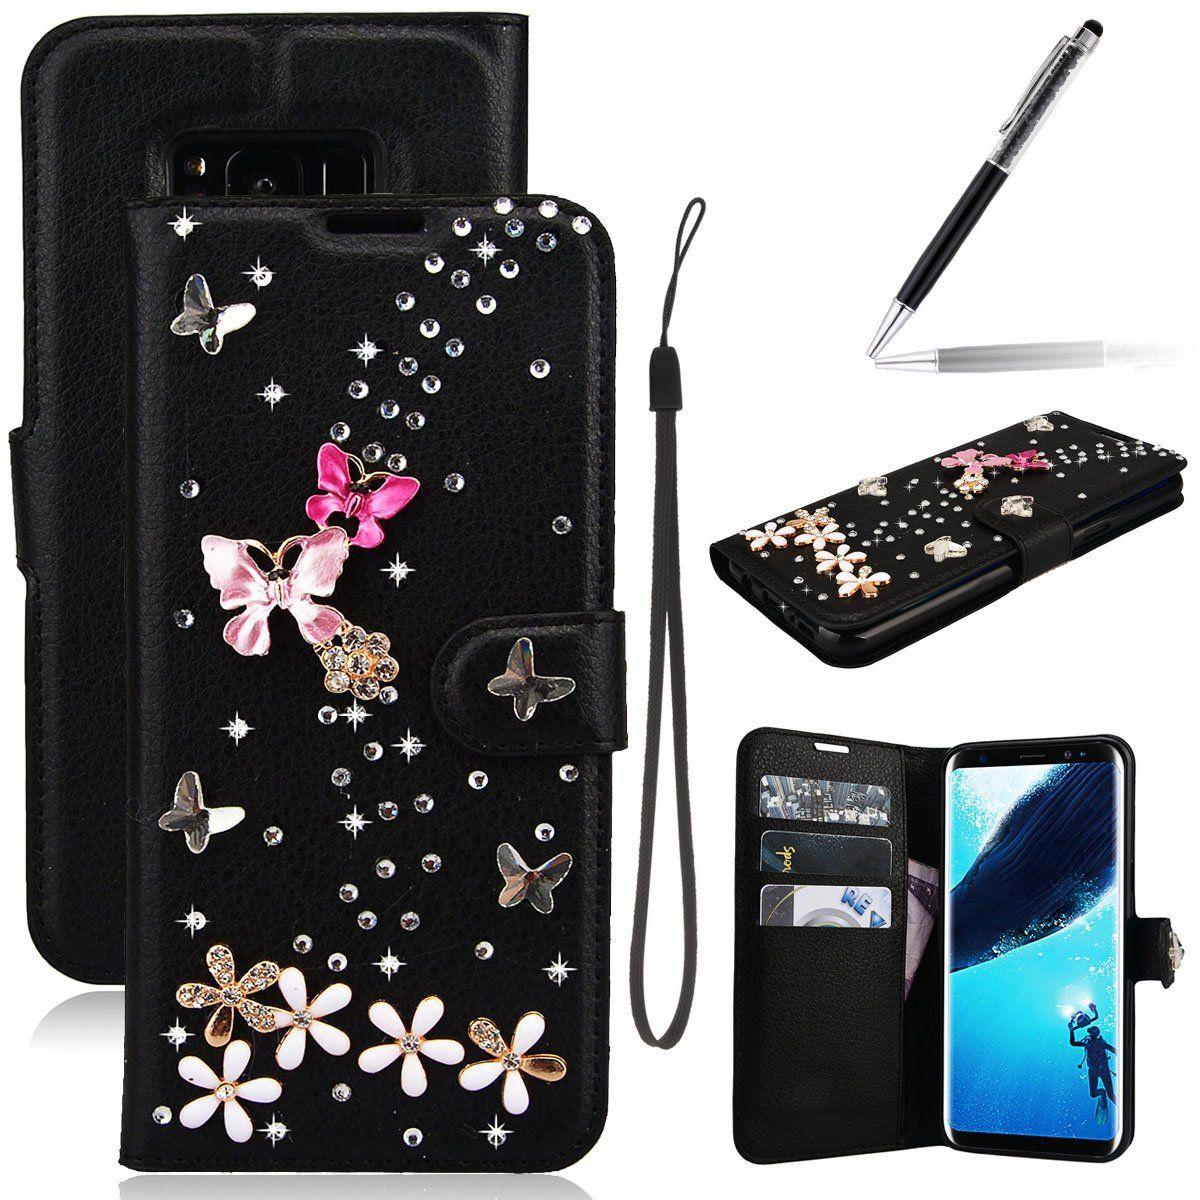 Grandever Samsung Galaxy S8 Glitzer Strass Hulle Leder Handyhulle Pin Enthalt Werbelinks Lederhulle Handy Samsung